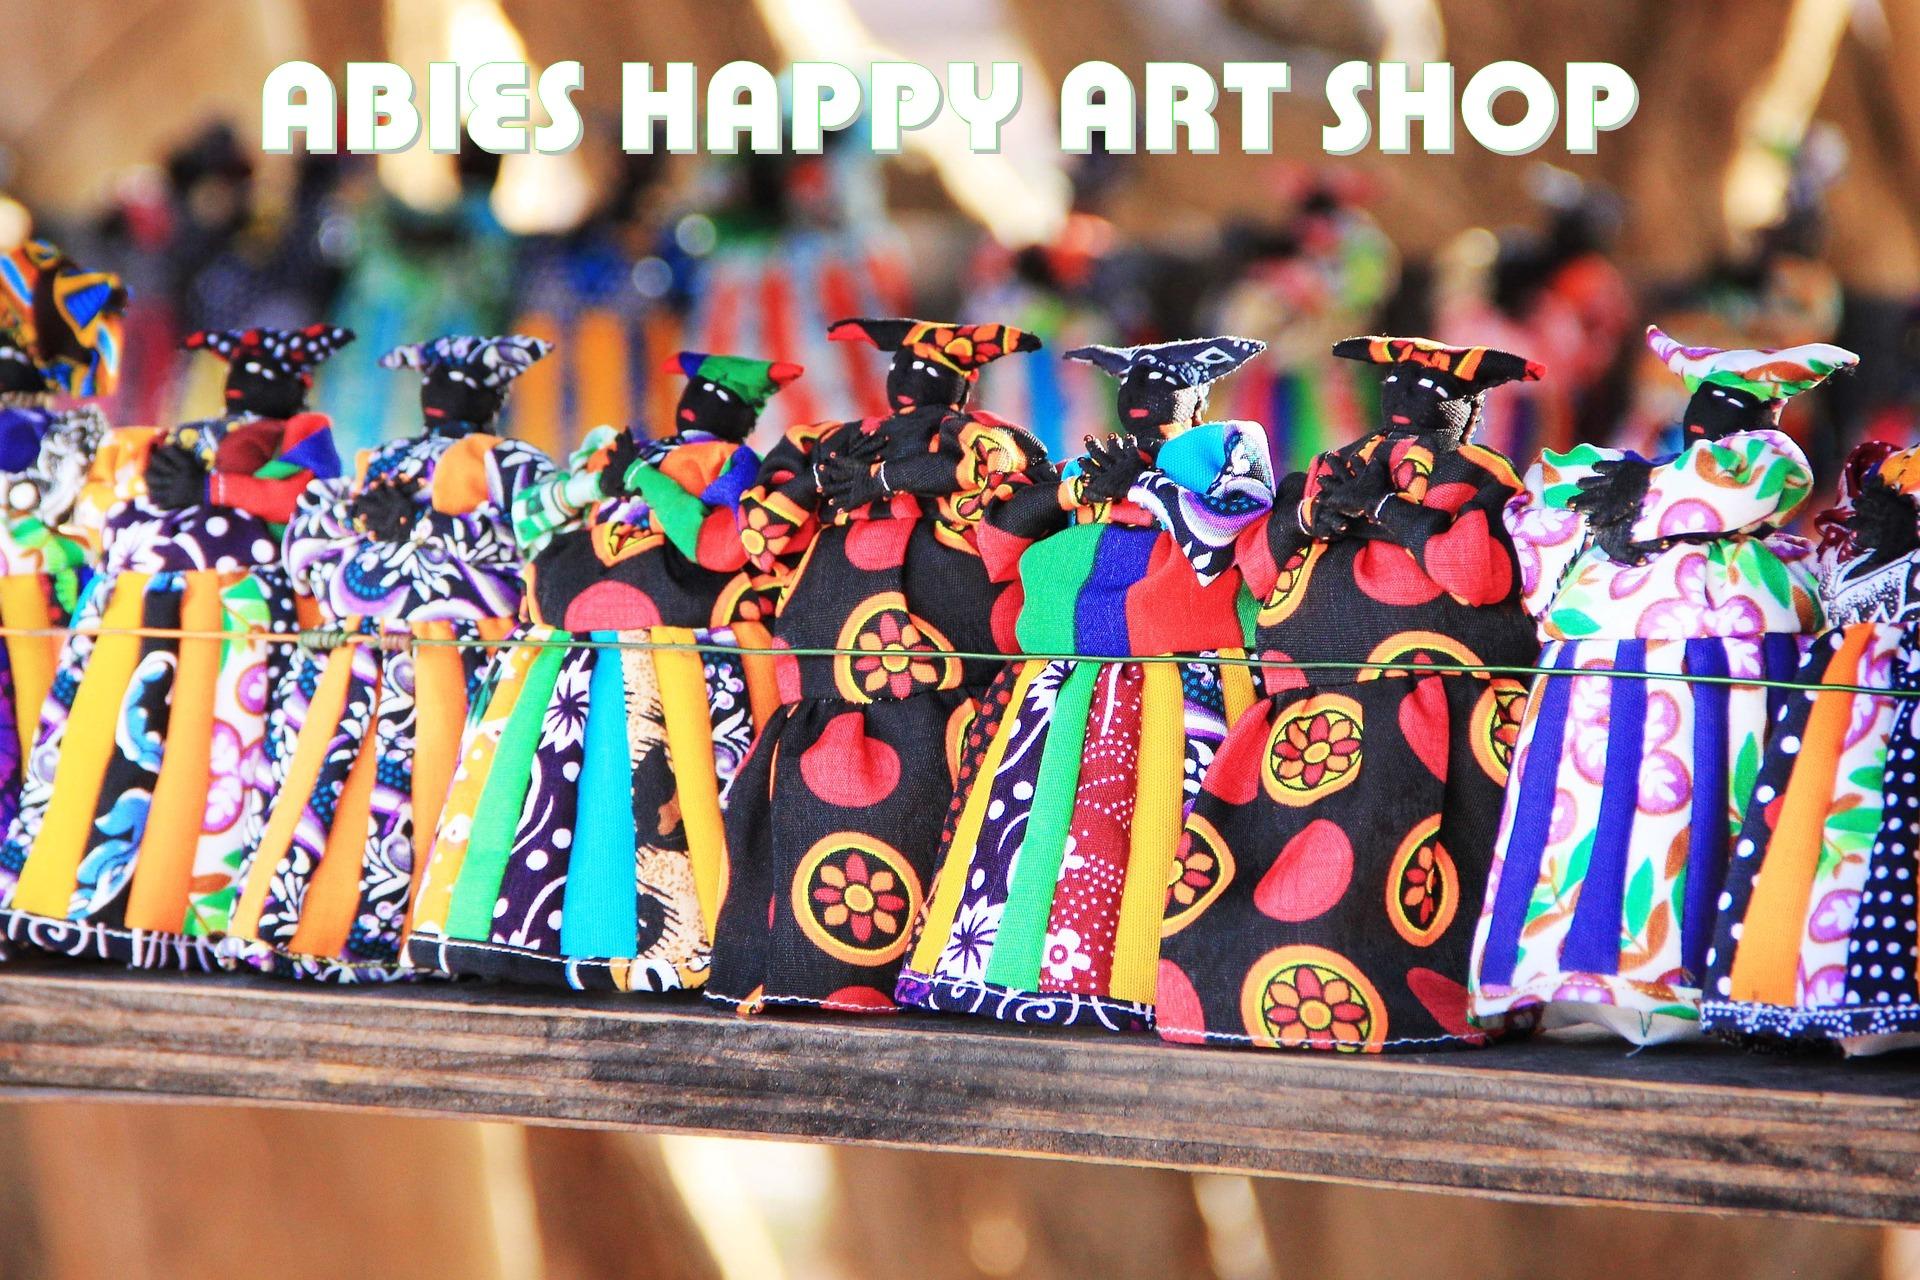 Abies Happy Art Shop